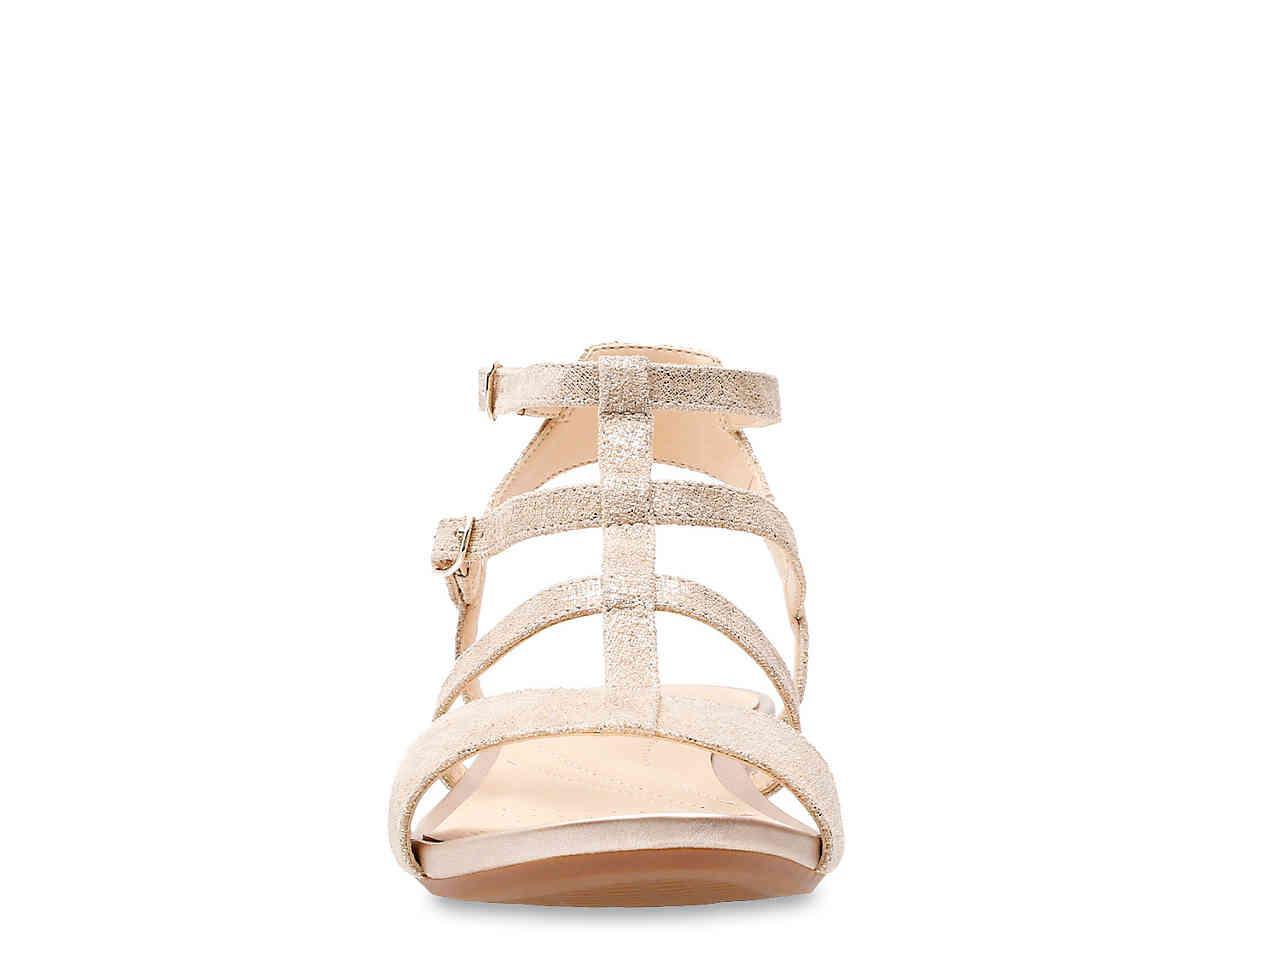 9e2297e2b7f66 Lyst - Clarks Parram Spice Gladiator Sandal in Metallic - Save 56%